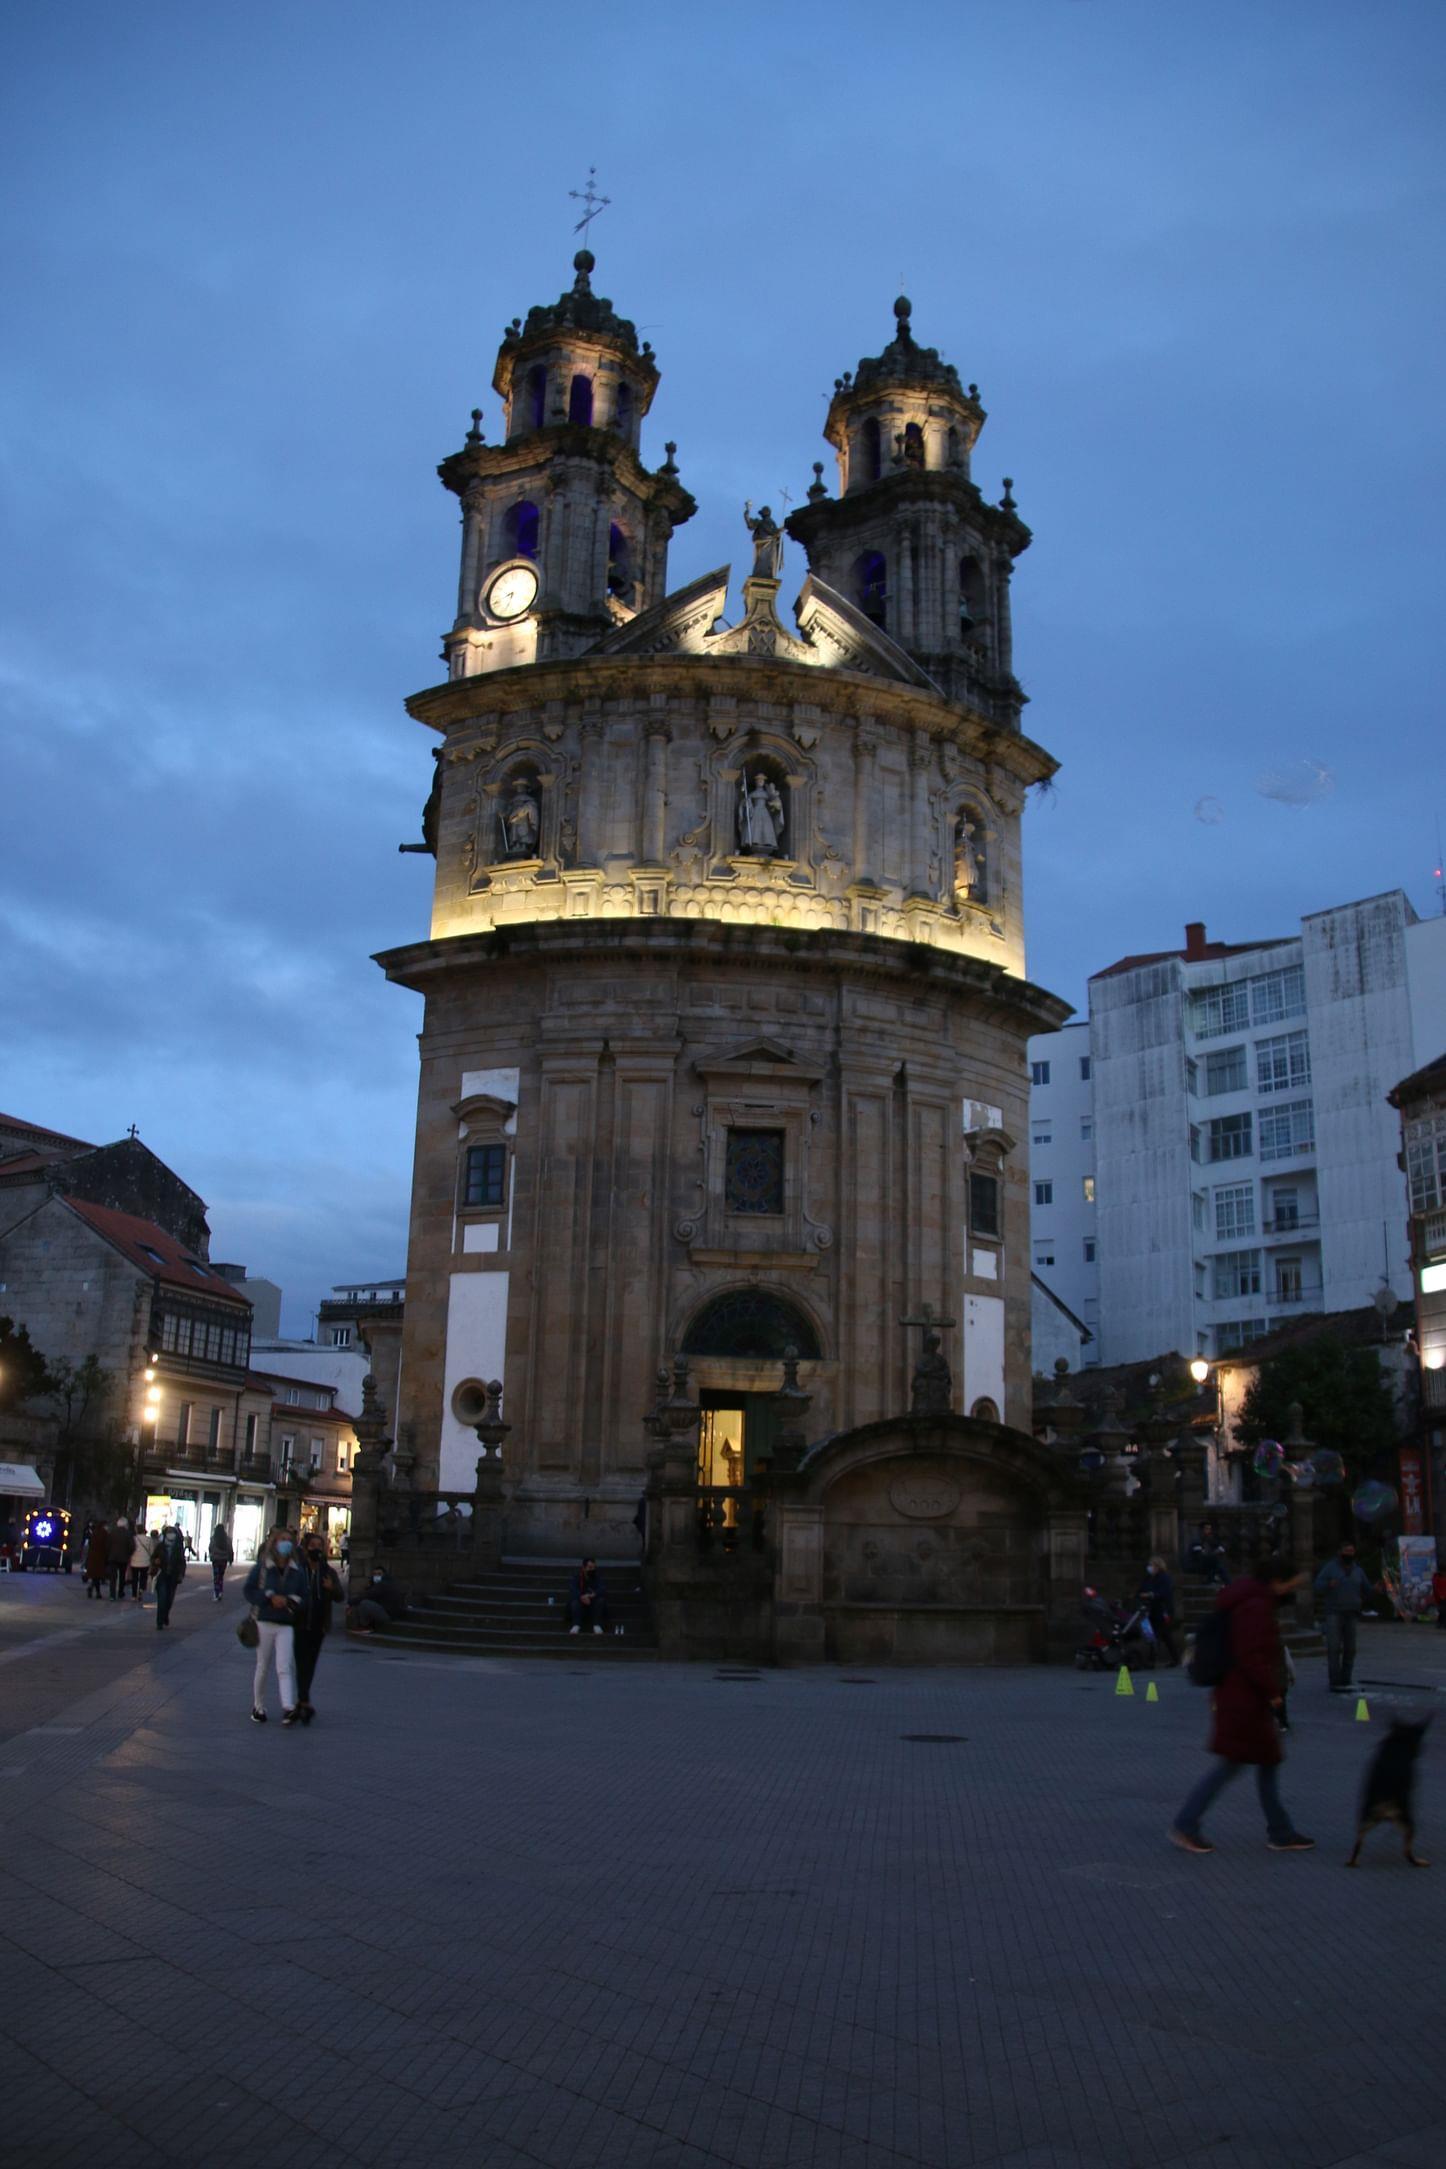 Free-Tour-Nocturno-Cristianos-y-Paganos-Pontevedra-3